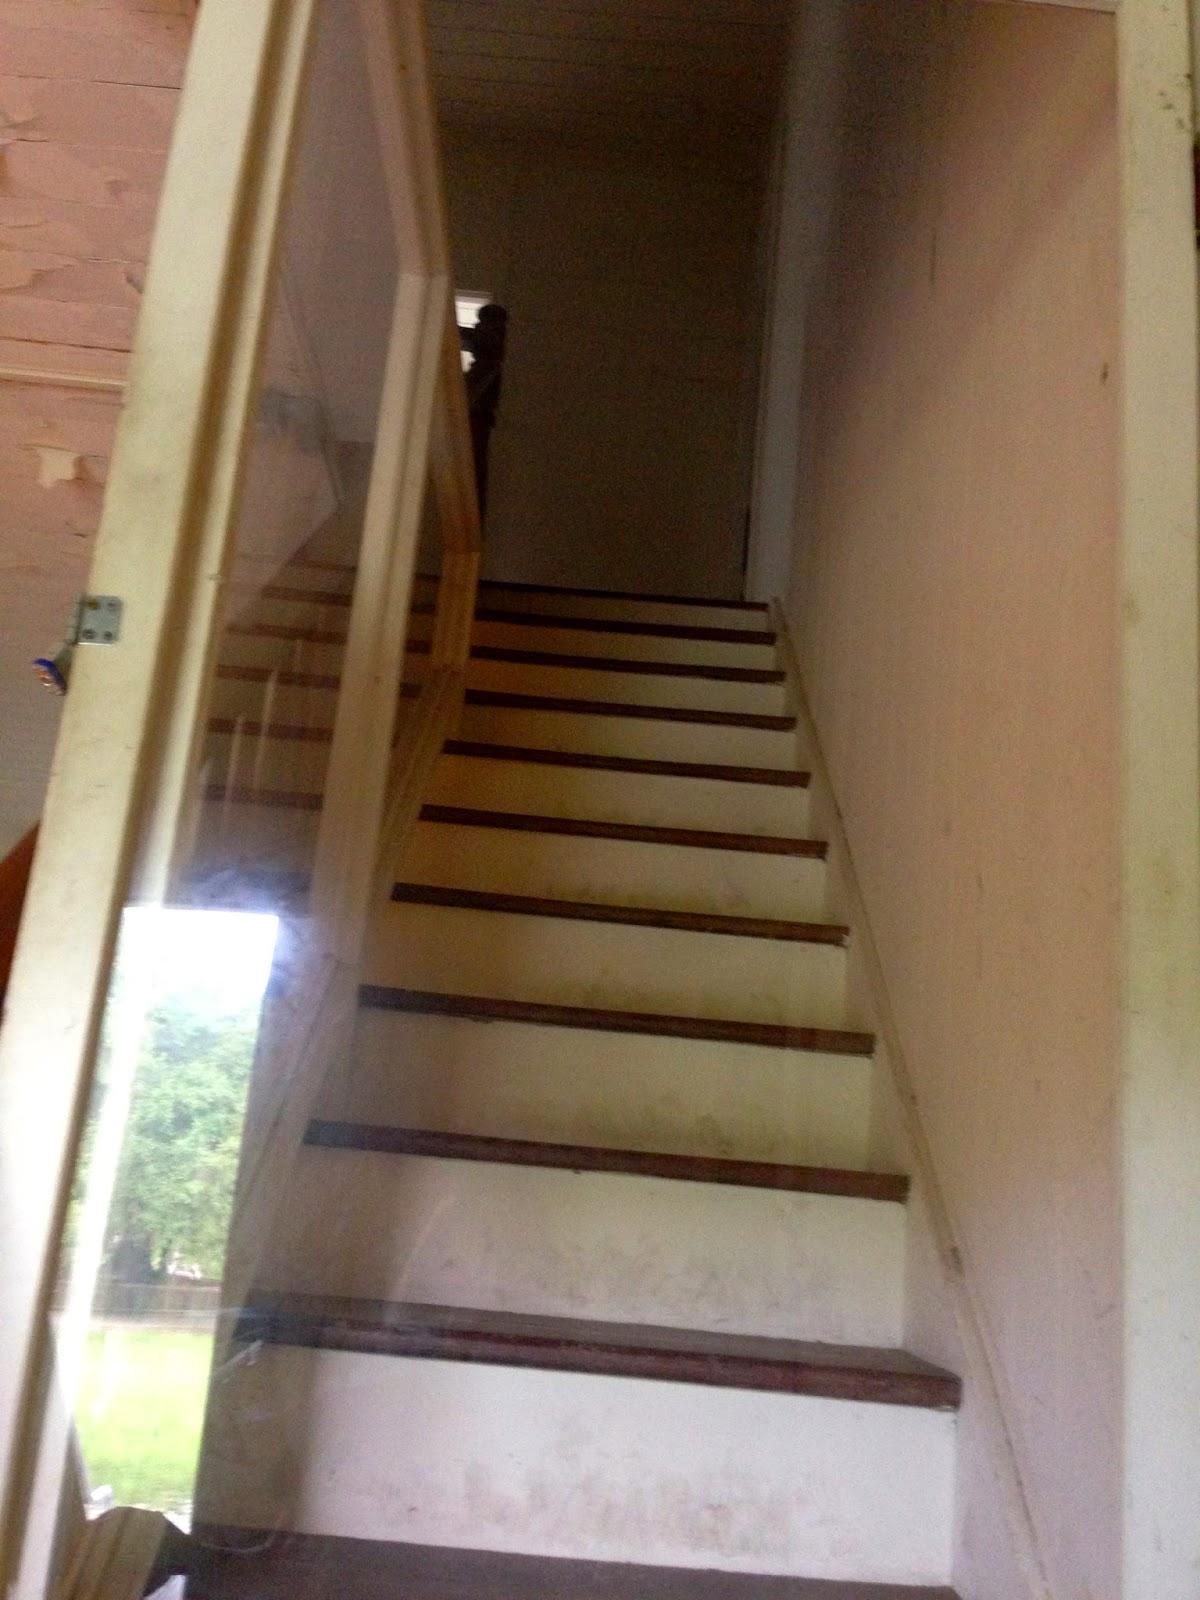 http://ouroutdoortravels.blogspot.com